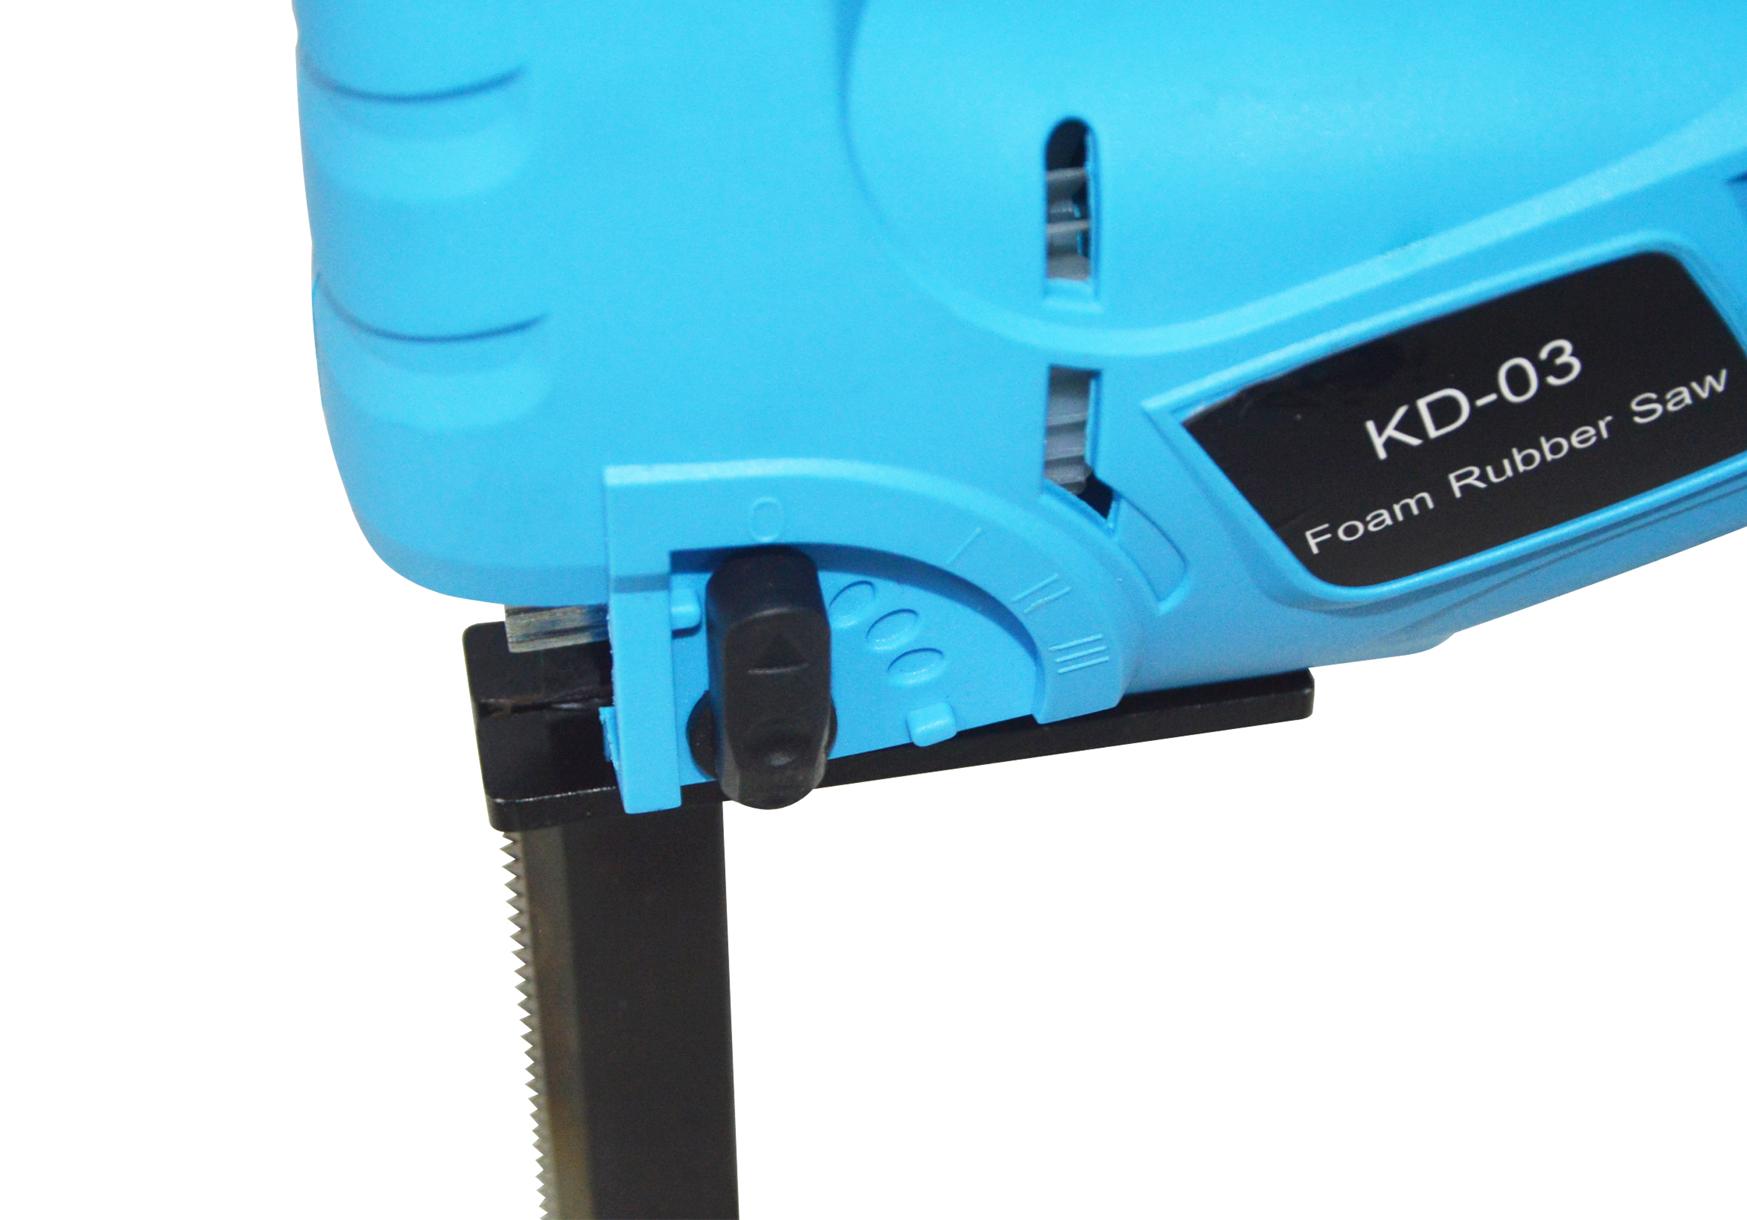 Electric foam rubber cutter saw for foam polyfoam rubber - Buy hand ...